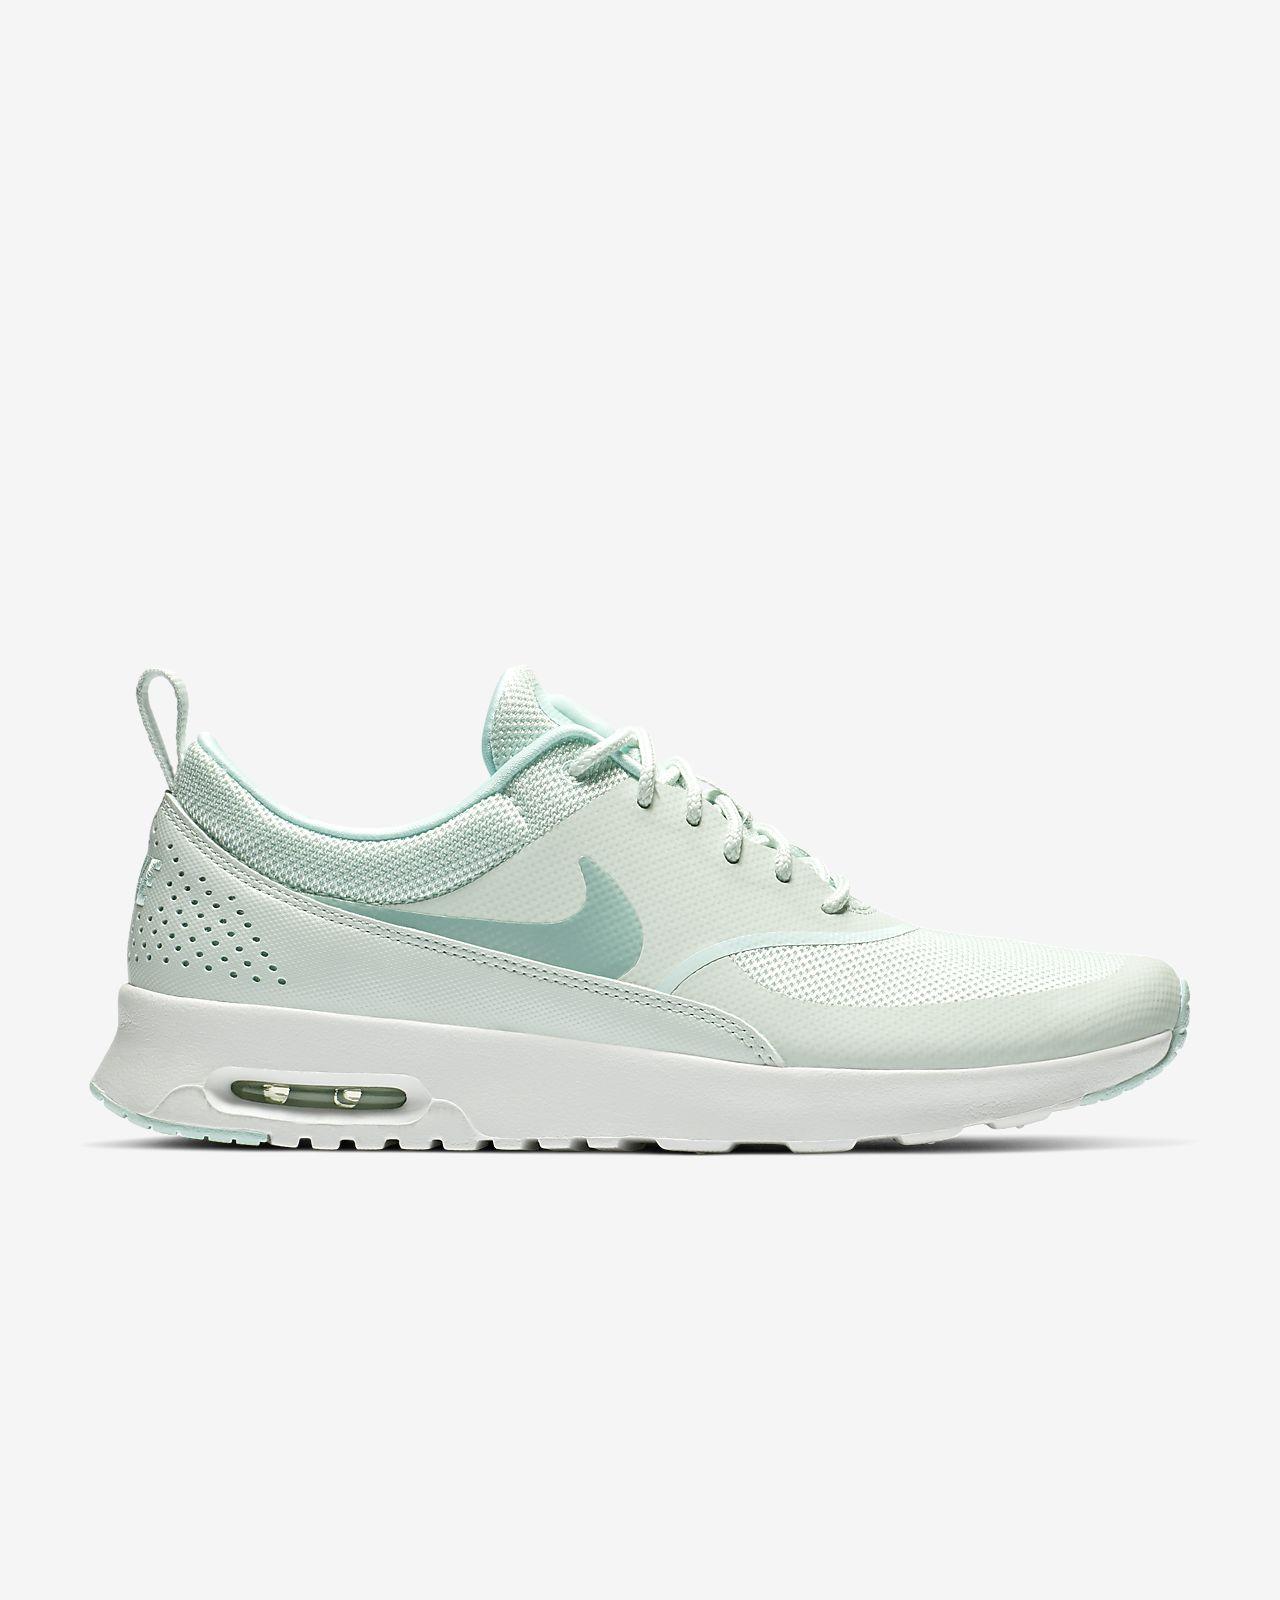 reputable site 626f2 6eeab ... Sko Nike Air Max Thea för kvinnor